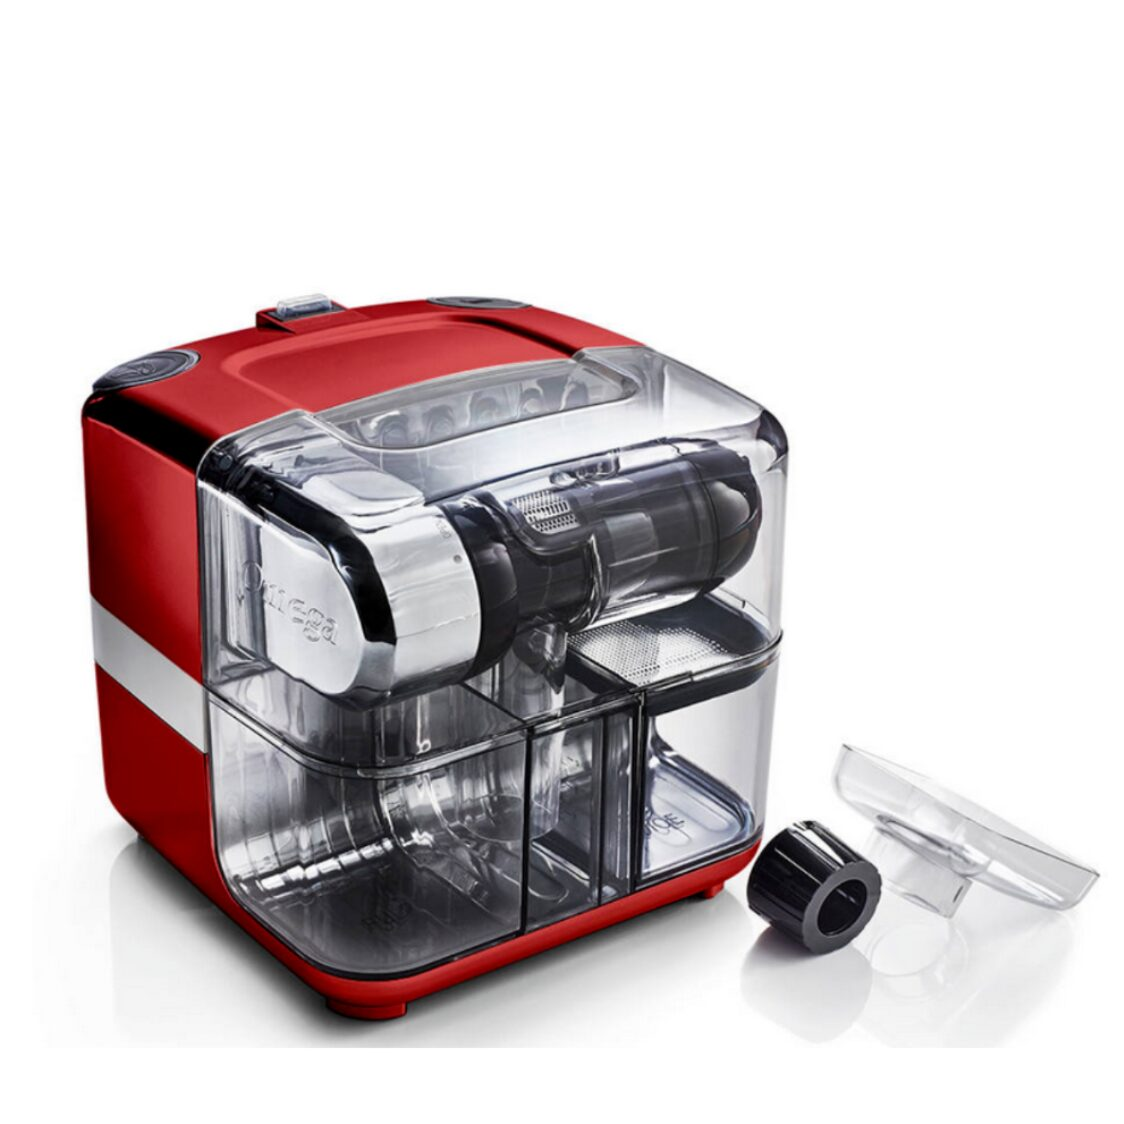 Omega USA Cube Juicer Red OMEGA003027